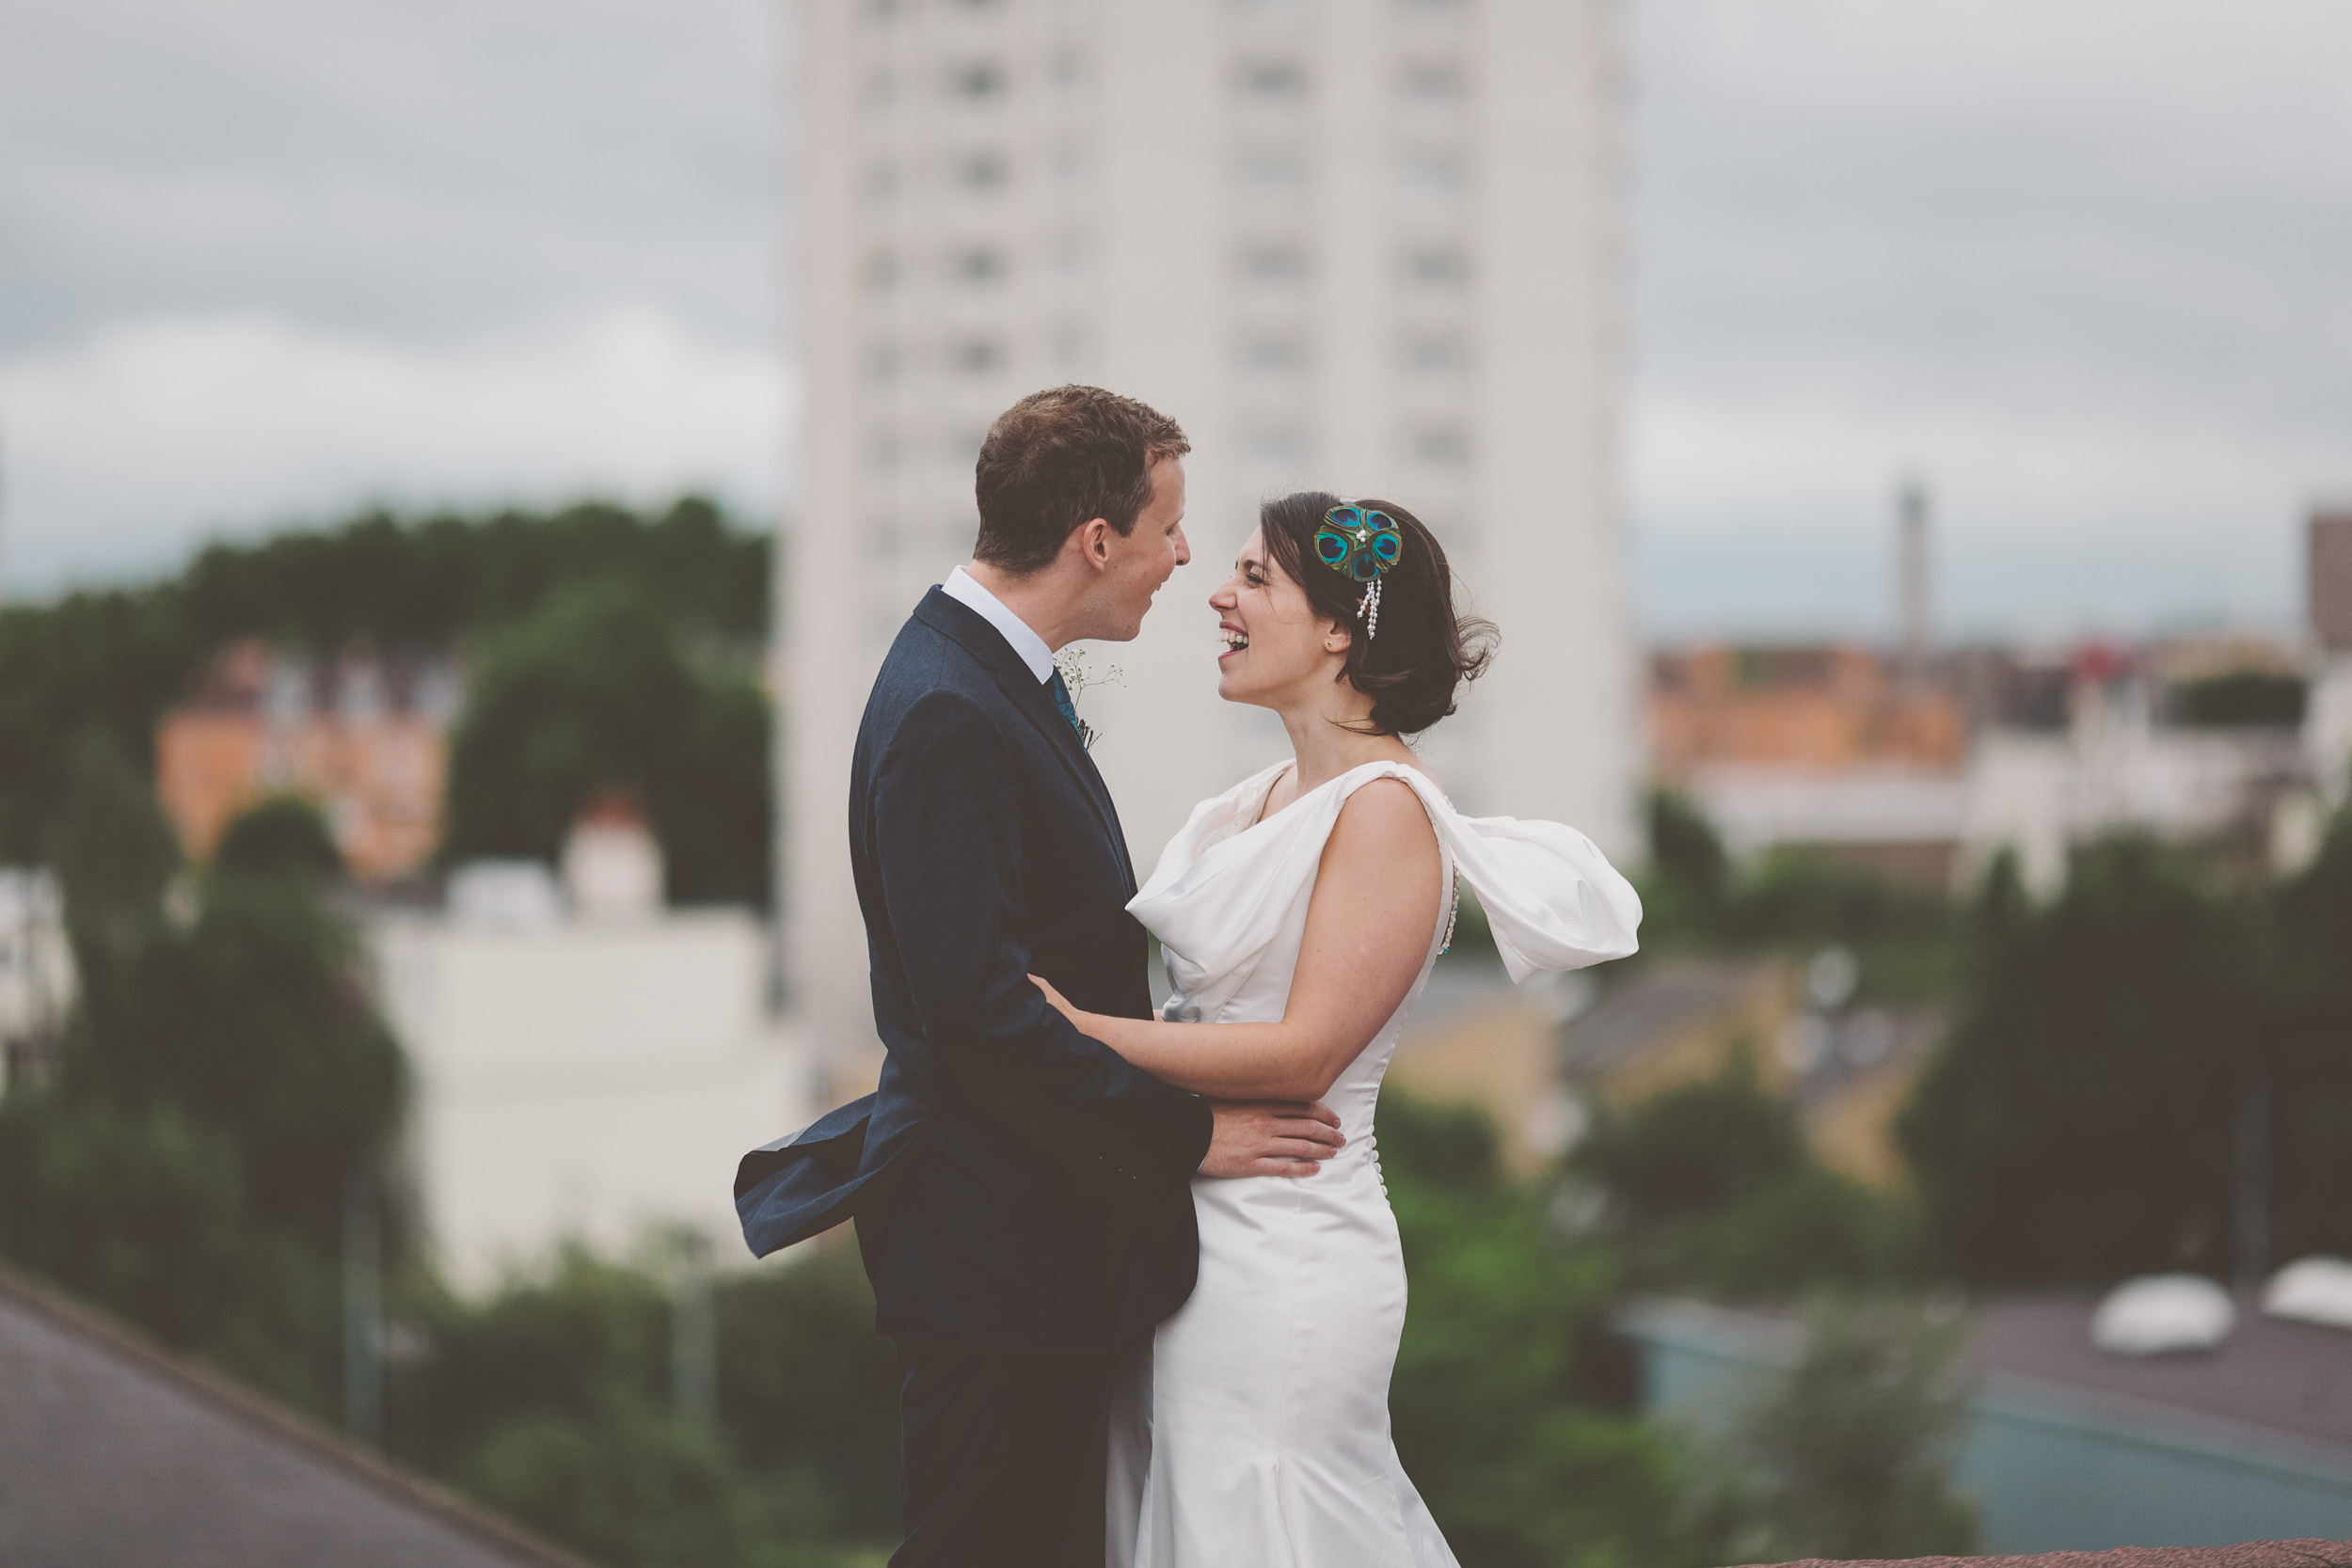 islington-town-hall-4th-floor-studios-wedding278.jpg